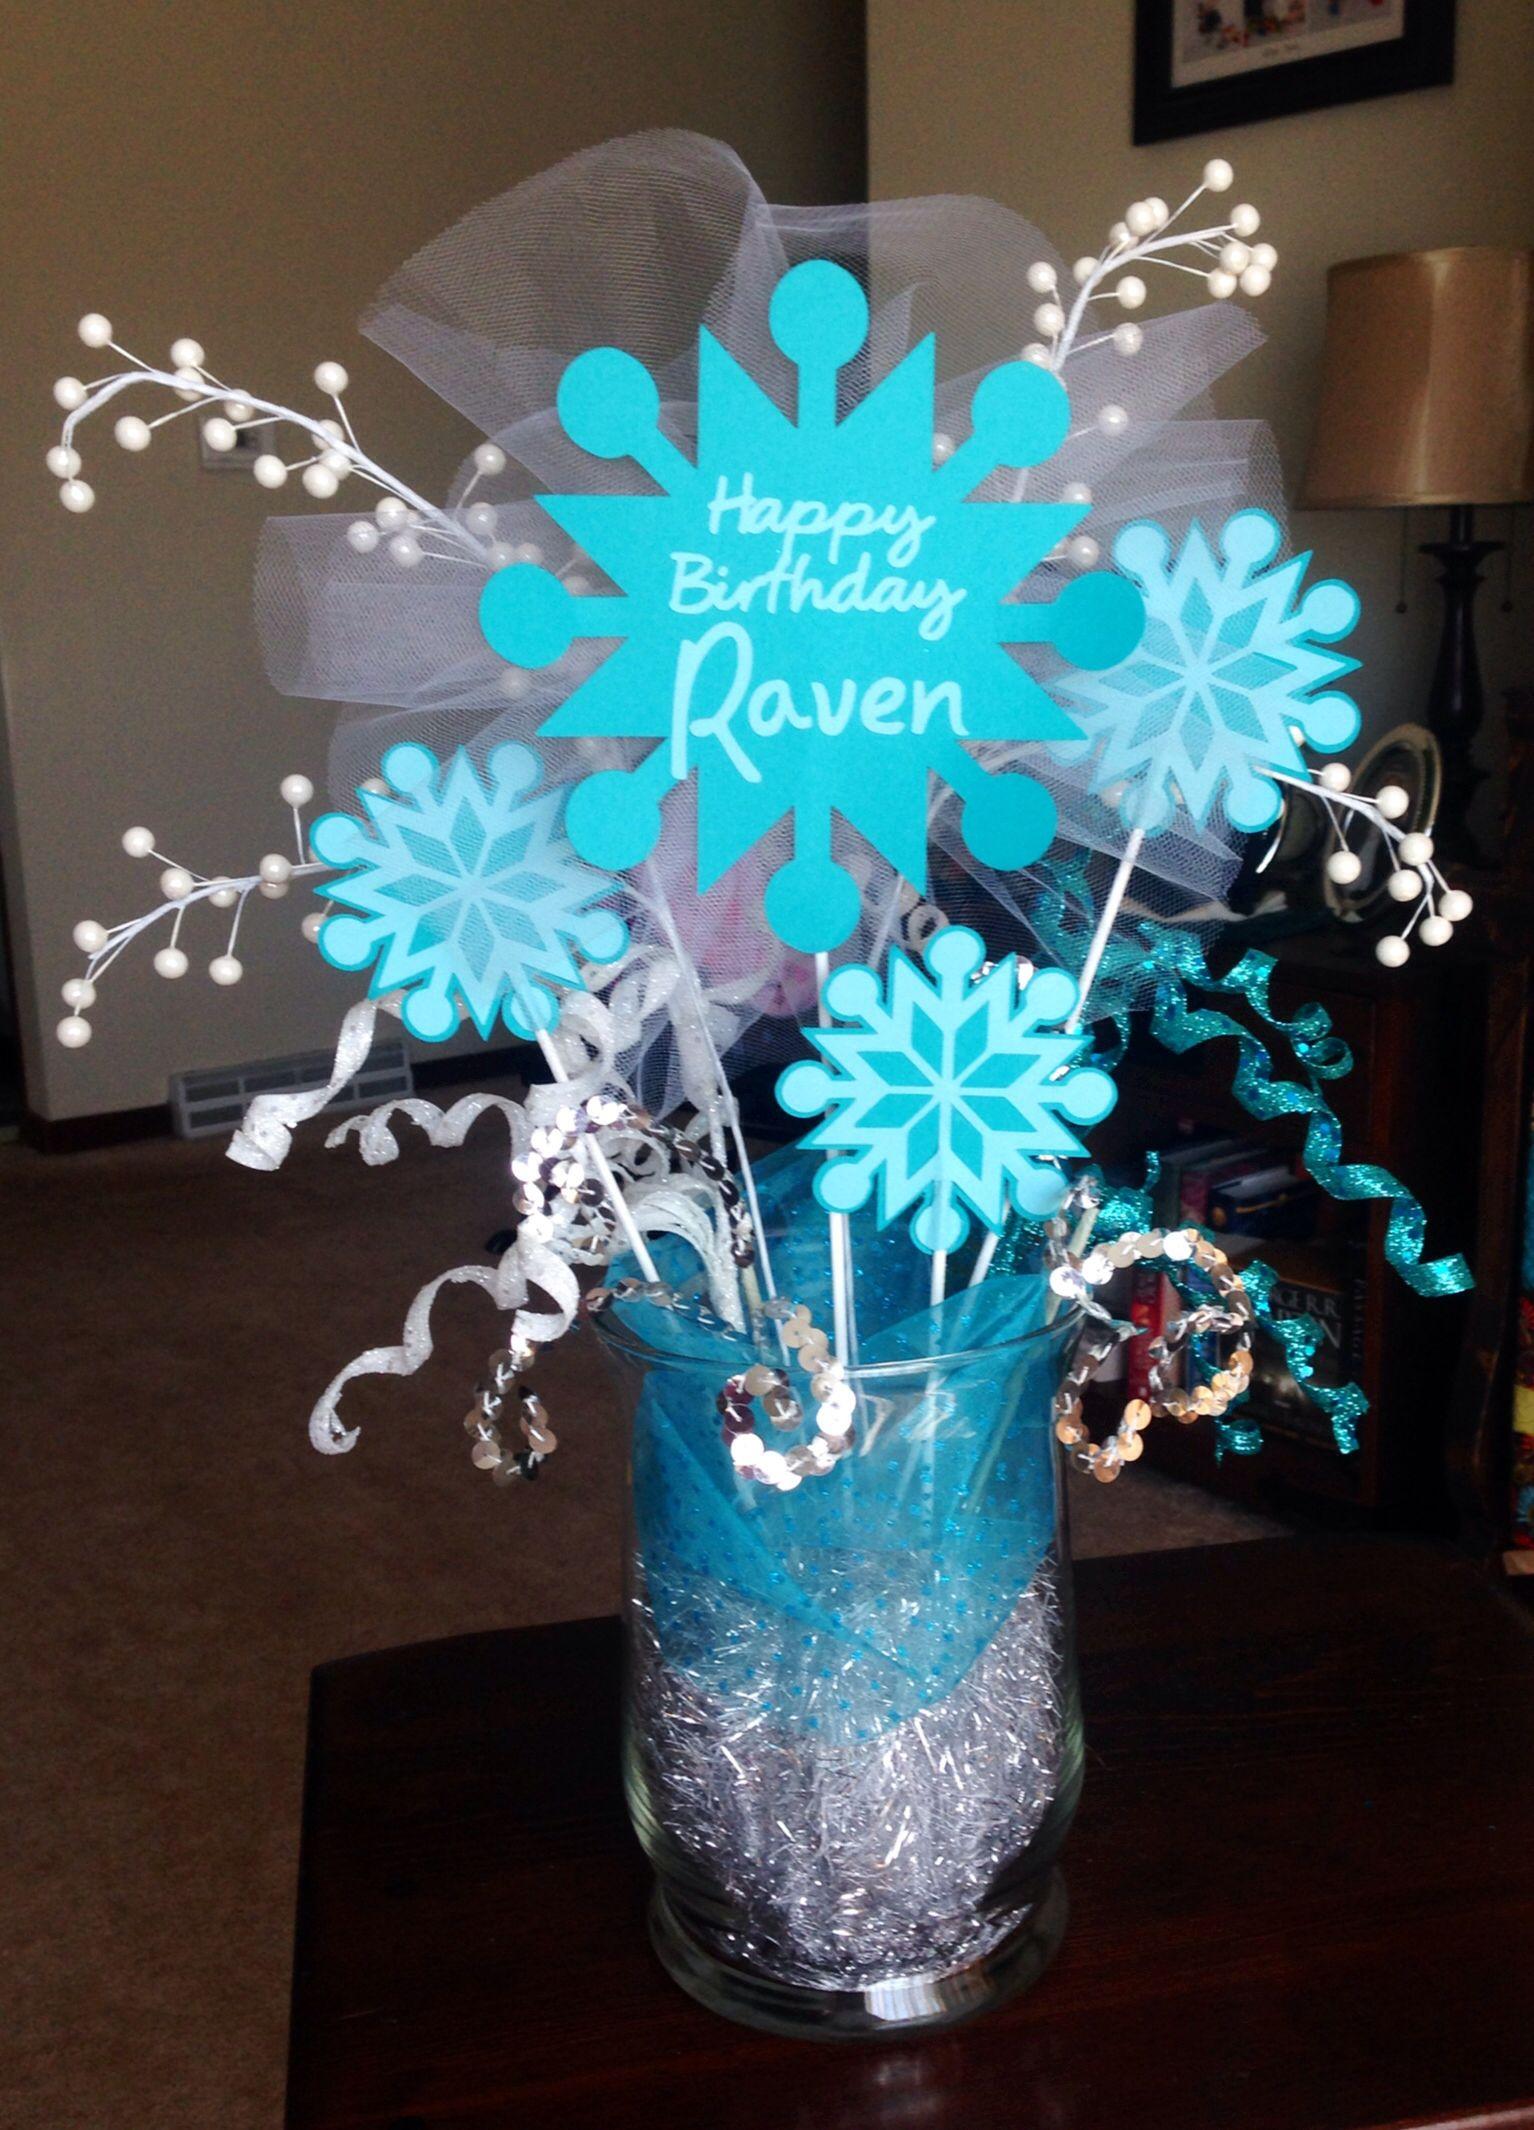 Pin By Julie Scutella On Diy Crafts Frozen Themed Birthday Party Elsa Birthday Party Frozen Birthday Theme